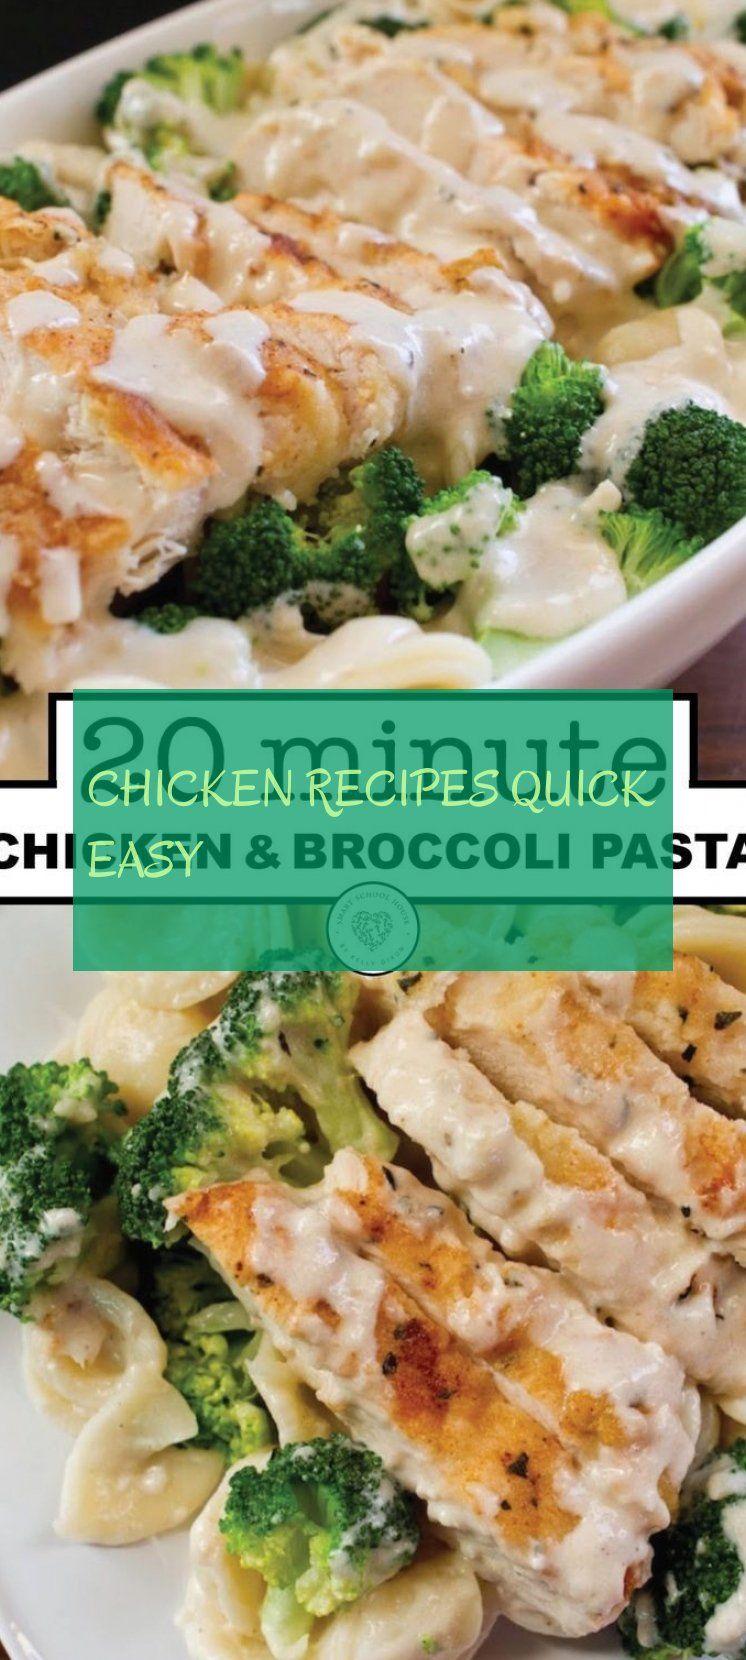 chicken recipes quick easy